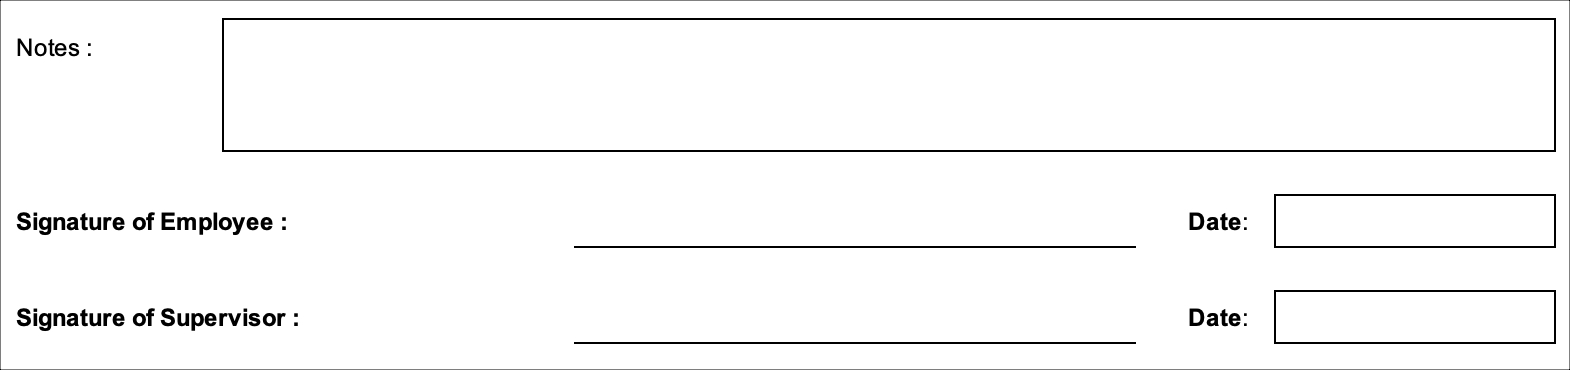 Simple Timesheet Signatures